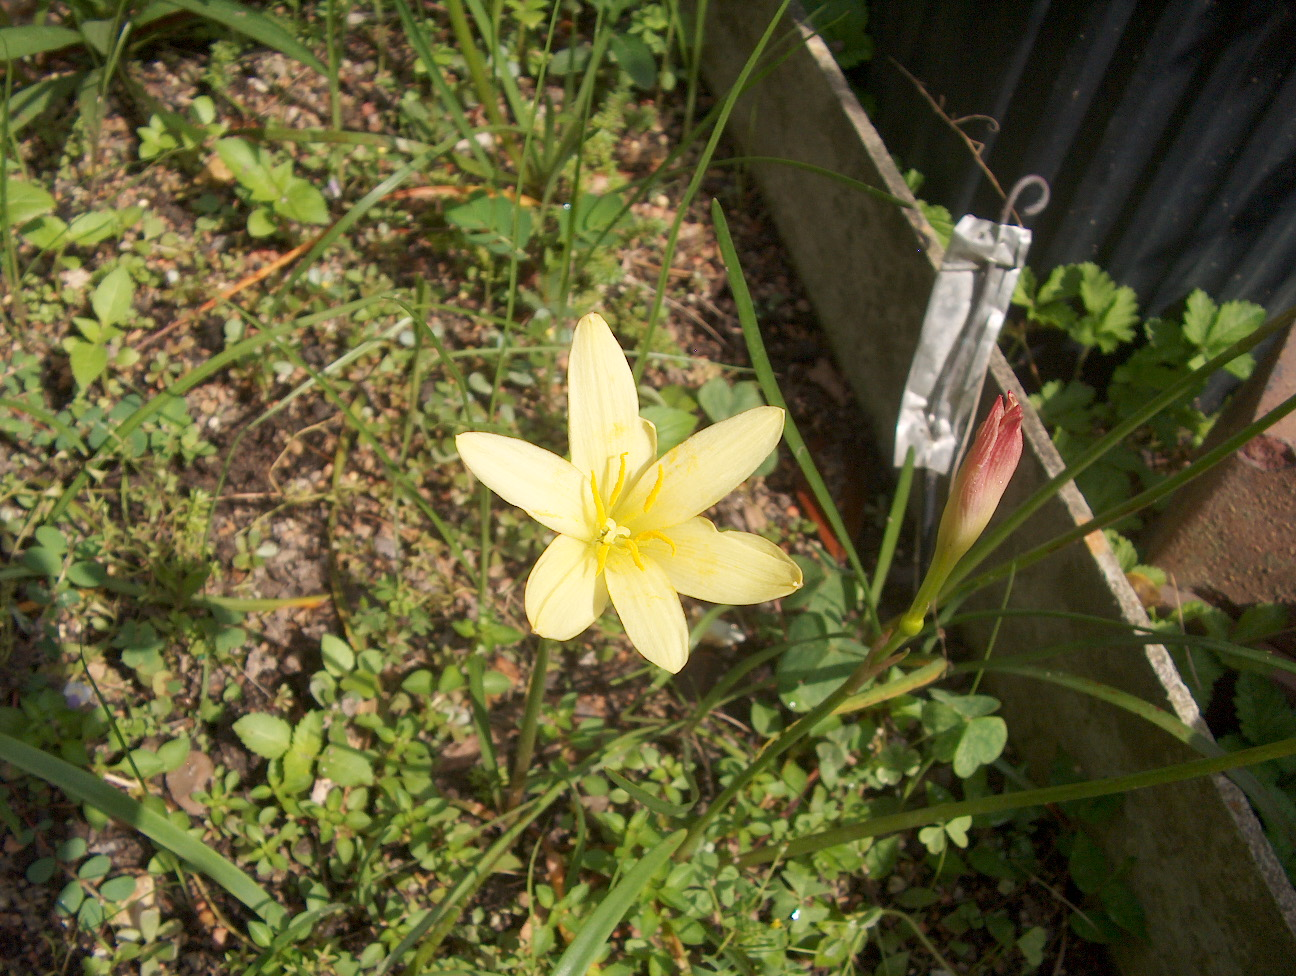 Zephyranthes primulina / Zephyranthes primulina